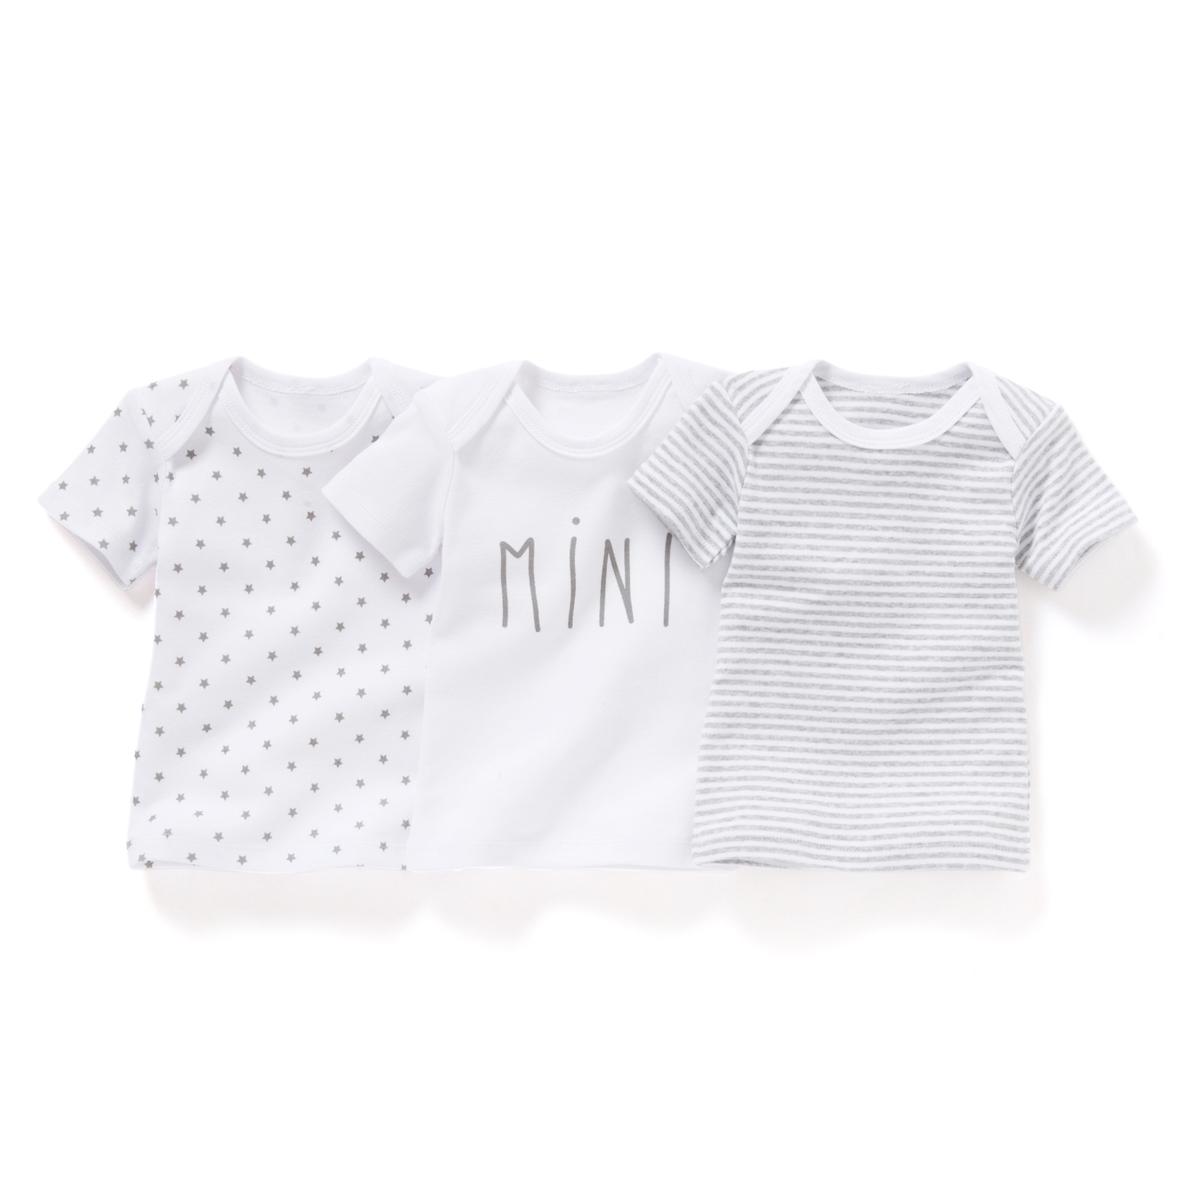 3 футболки хлопковых с рисунком, 0 мес. - 3 лет Oeko Tex